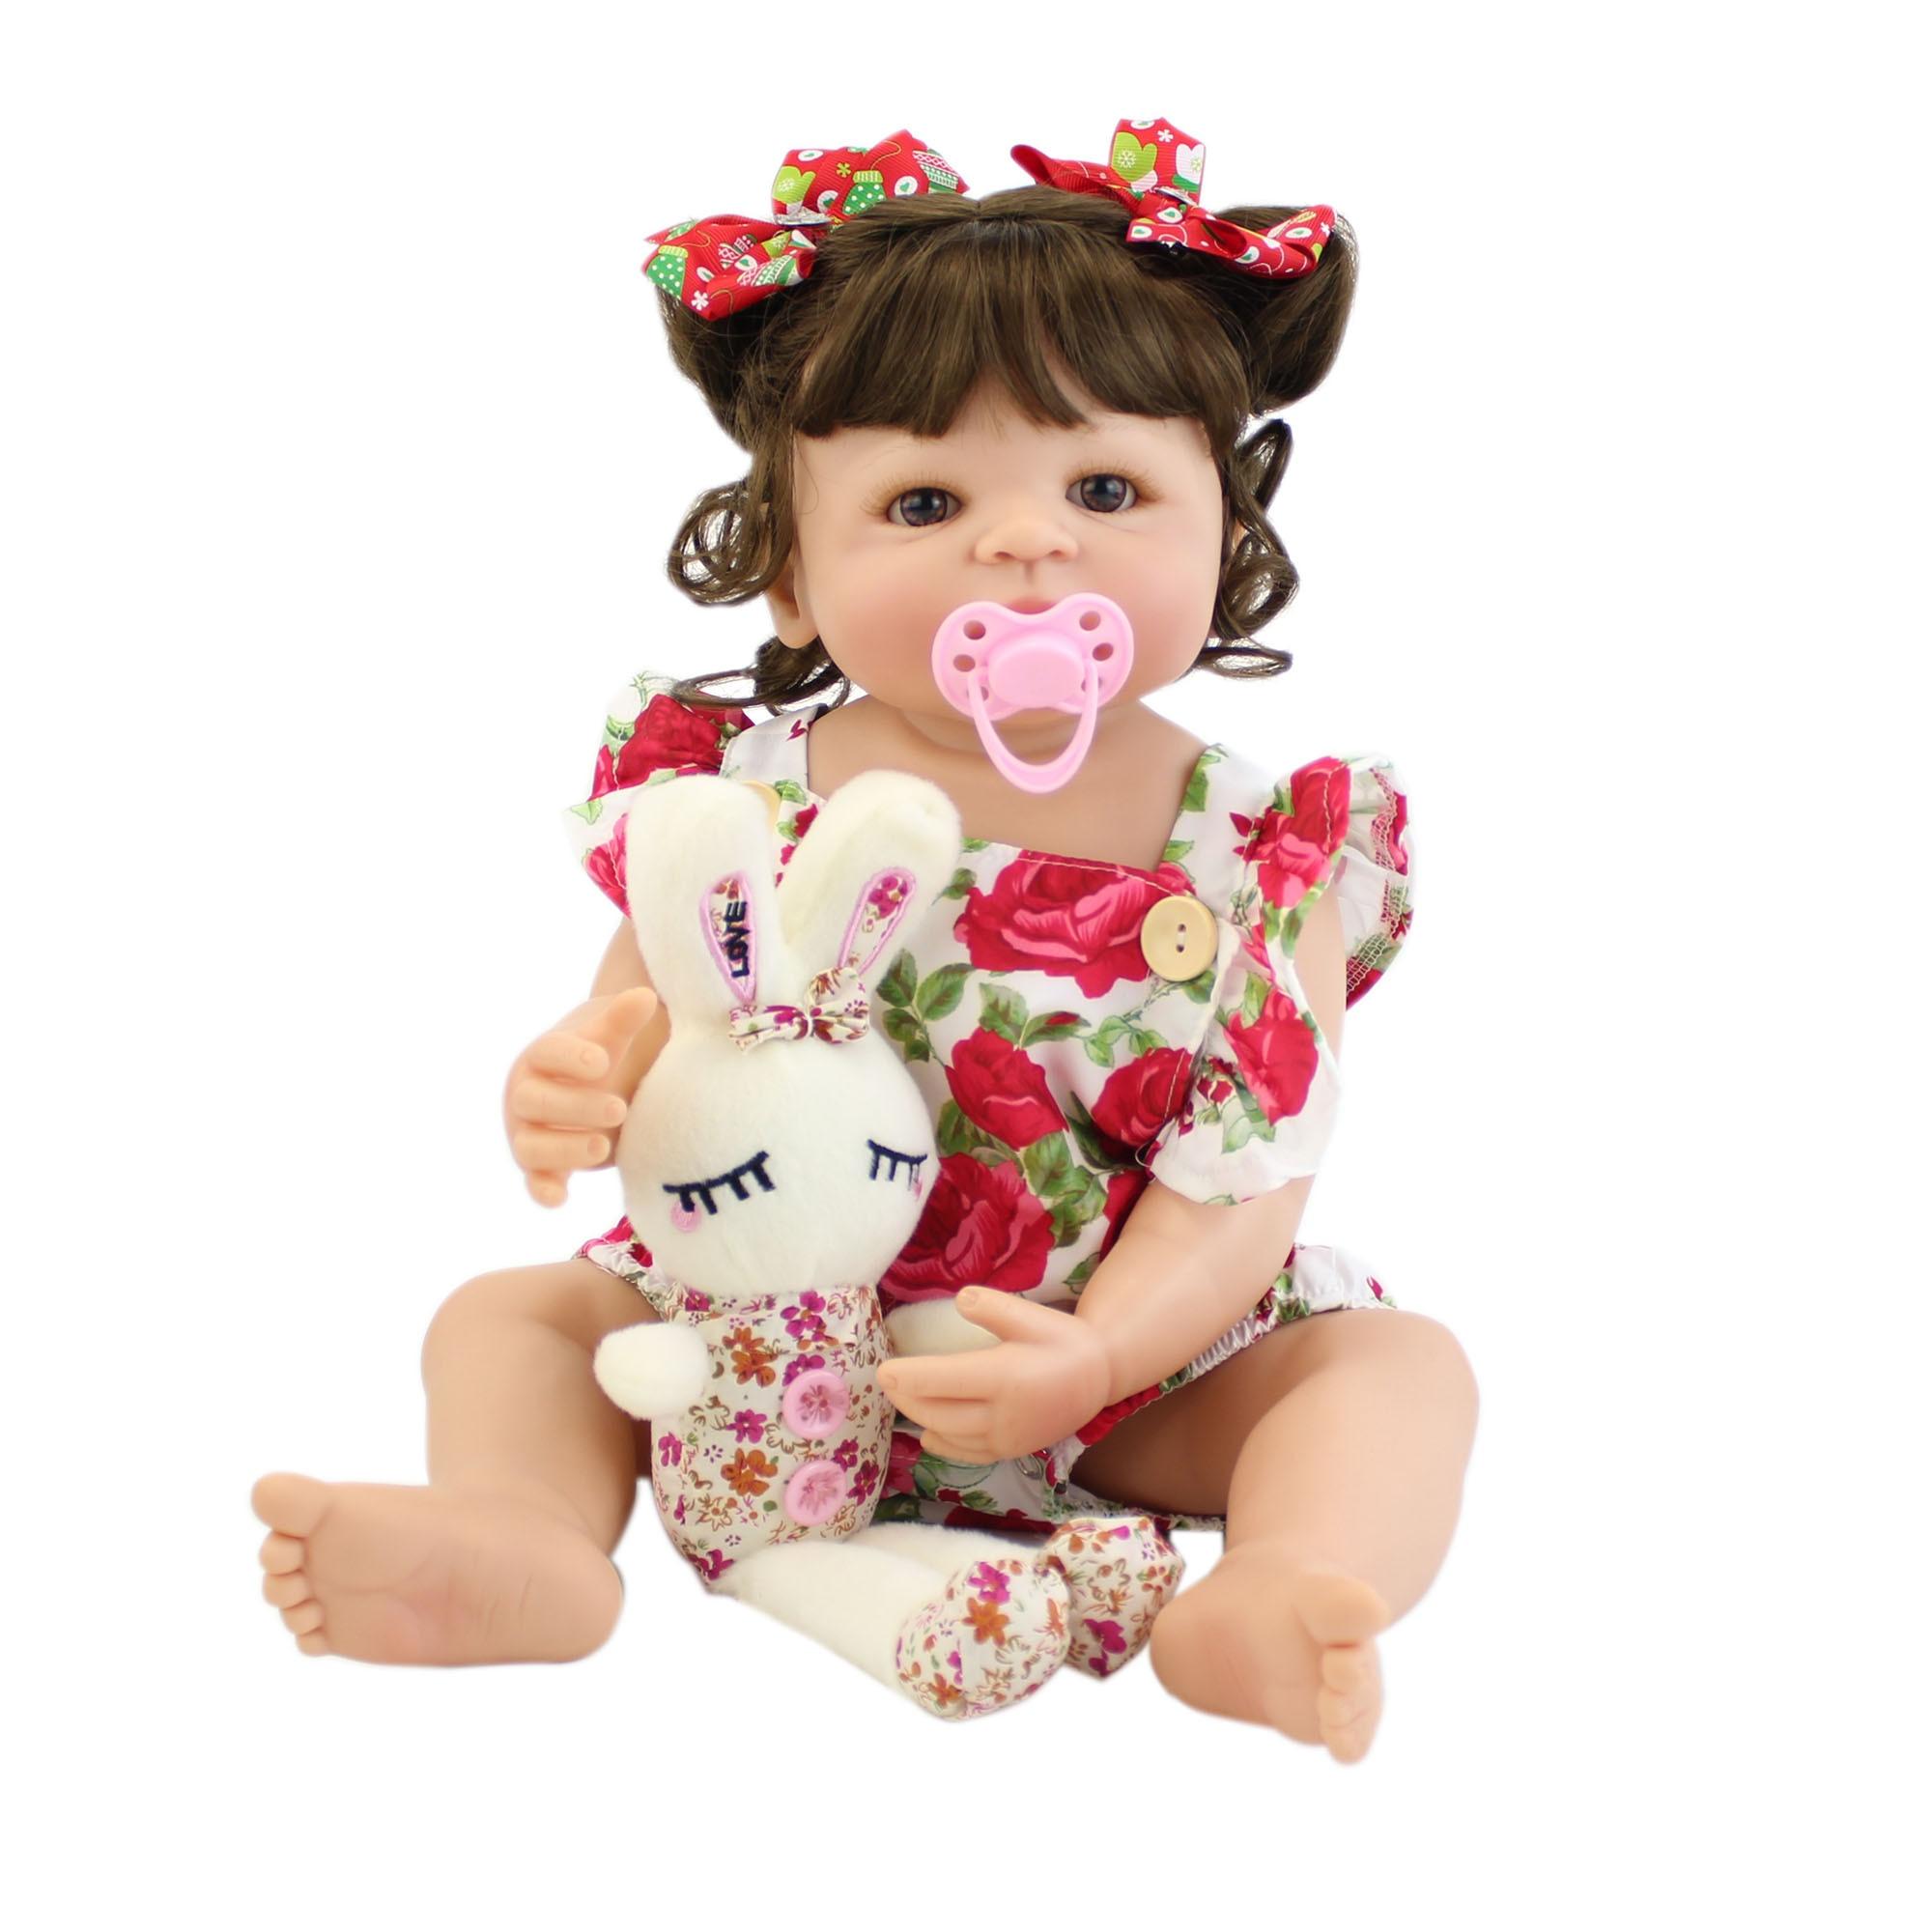 55cm Full Silicone Body Reborn Girl Doll Toy Soft Vinyl Newborn Babies Bebe Bathe Accompanying Toy